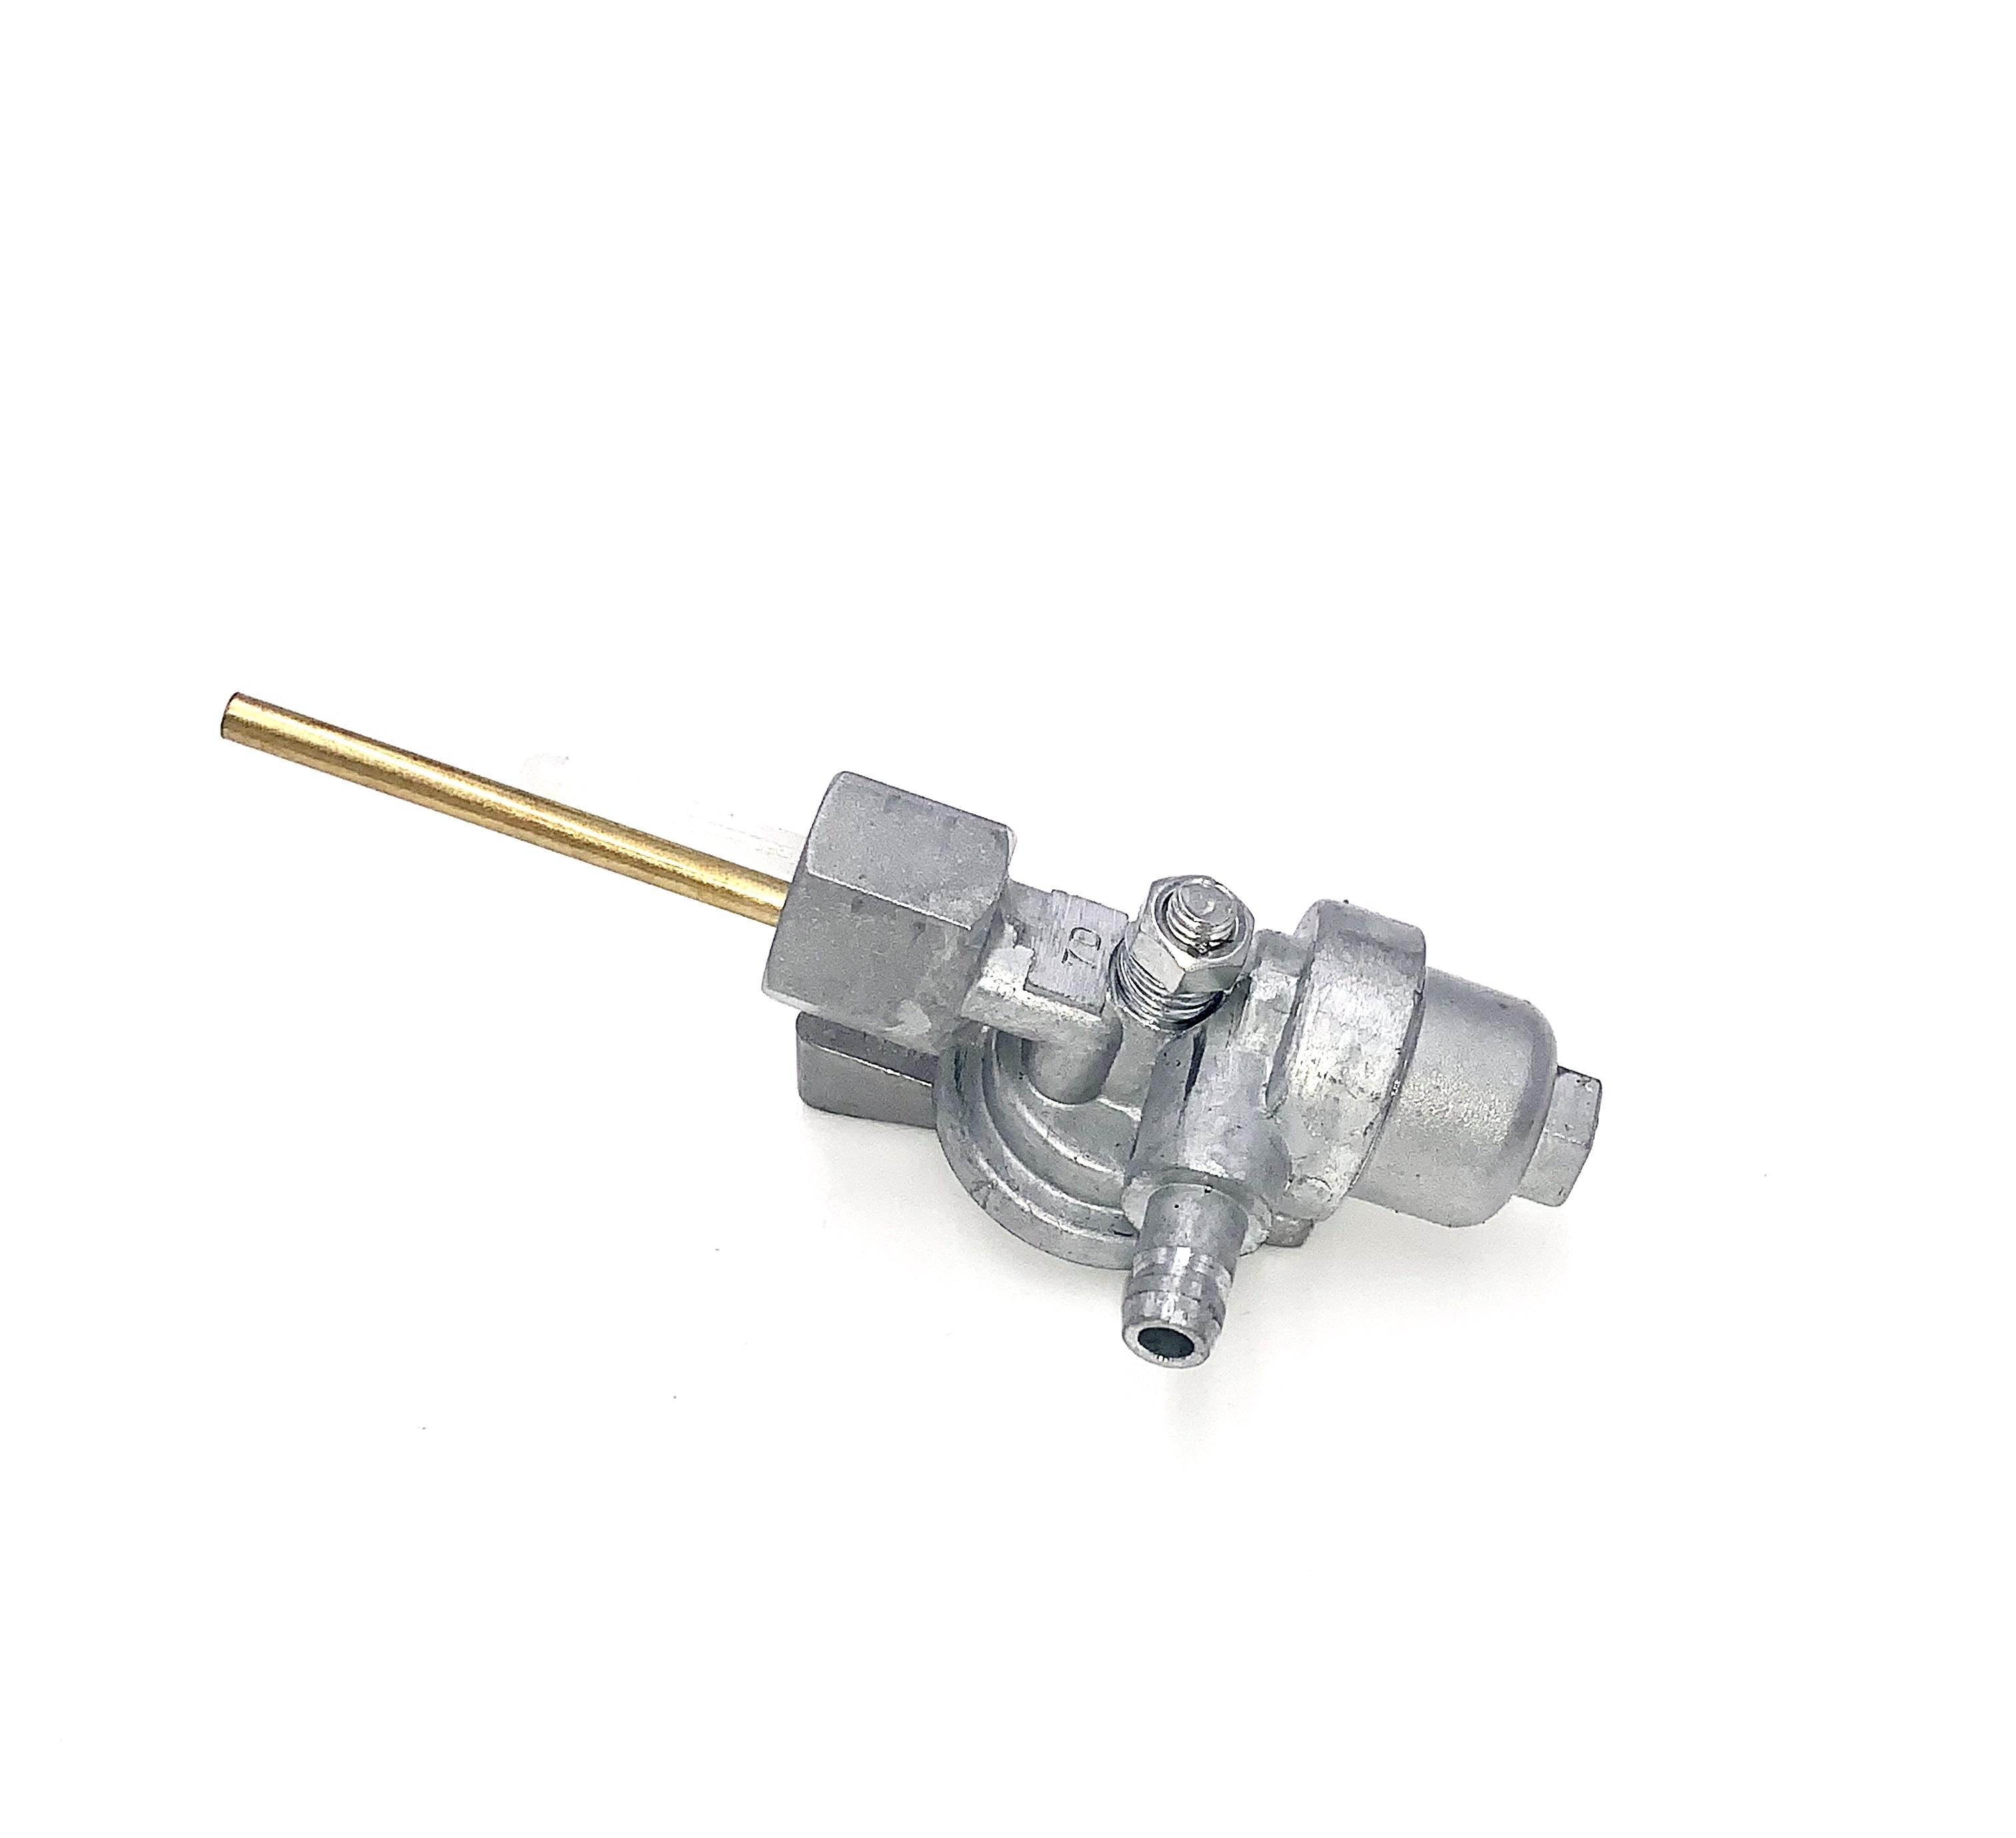 K/&L Supply Fuel Petcock 18-4170